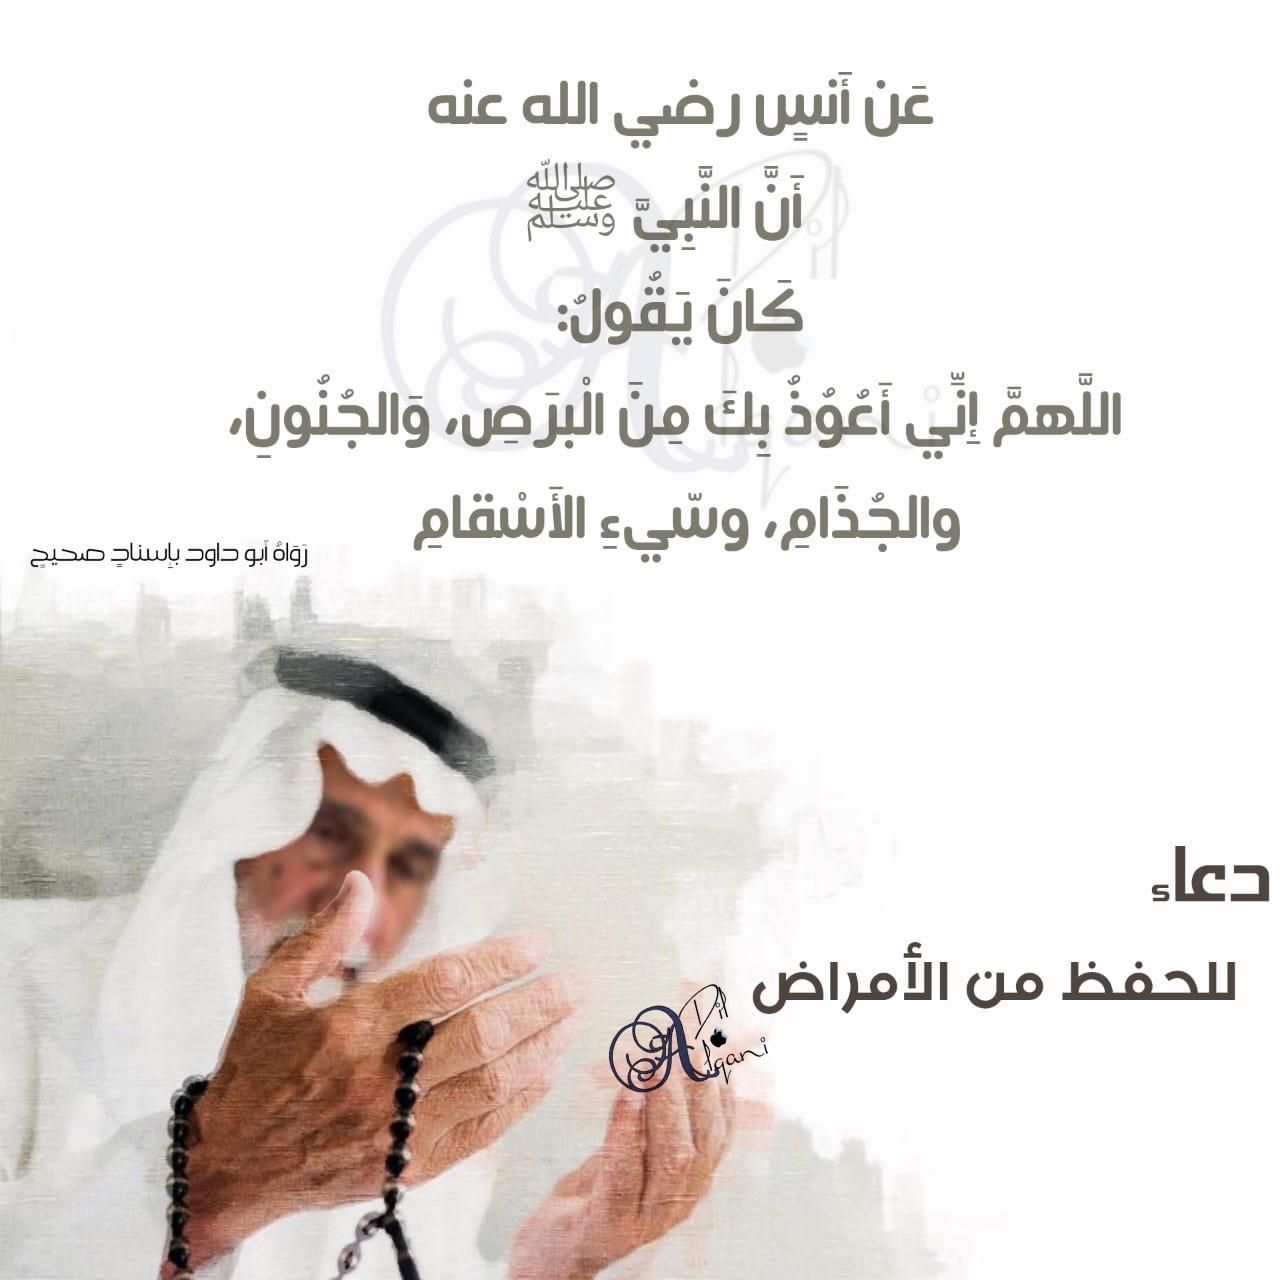 دعاء الحفظ من الامراض Doua Islam Doua Islam